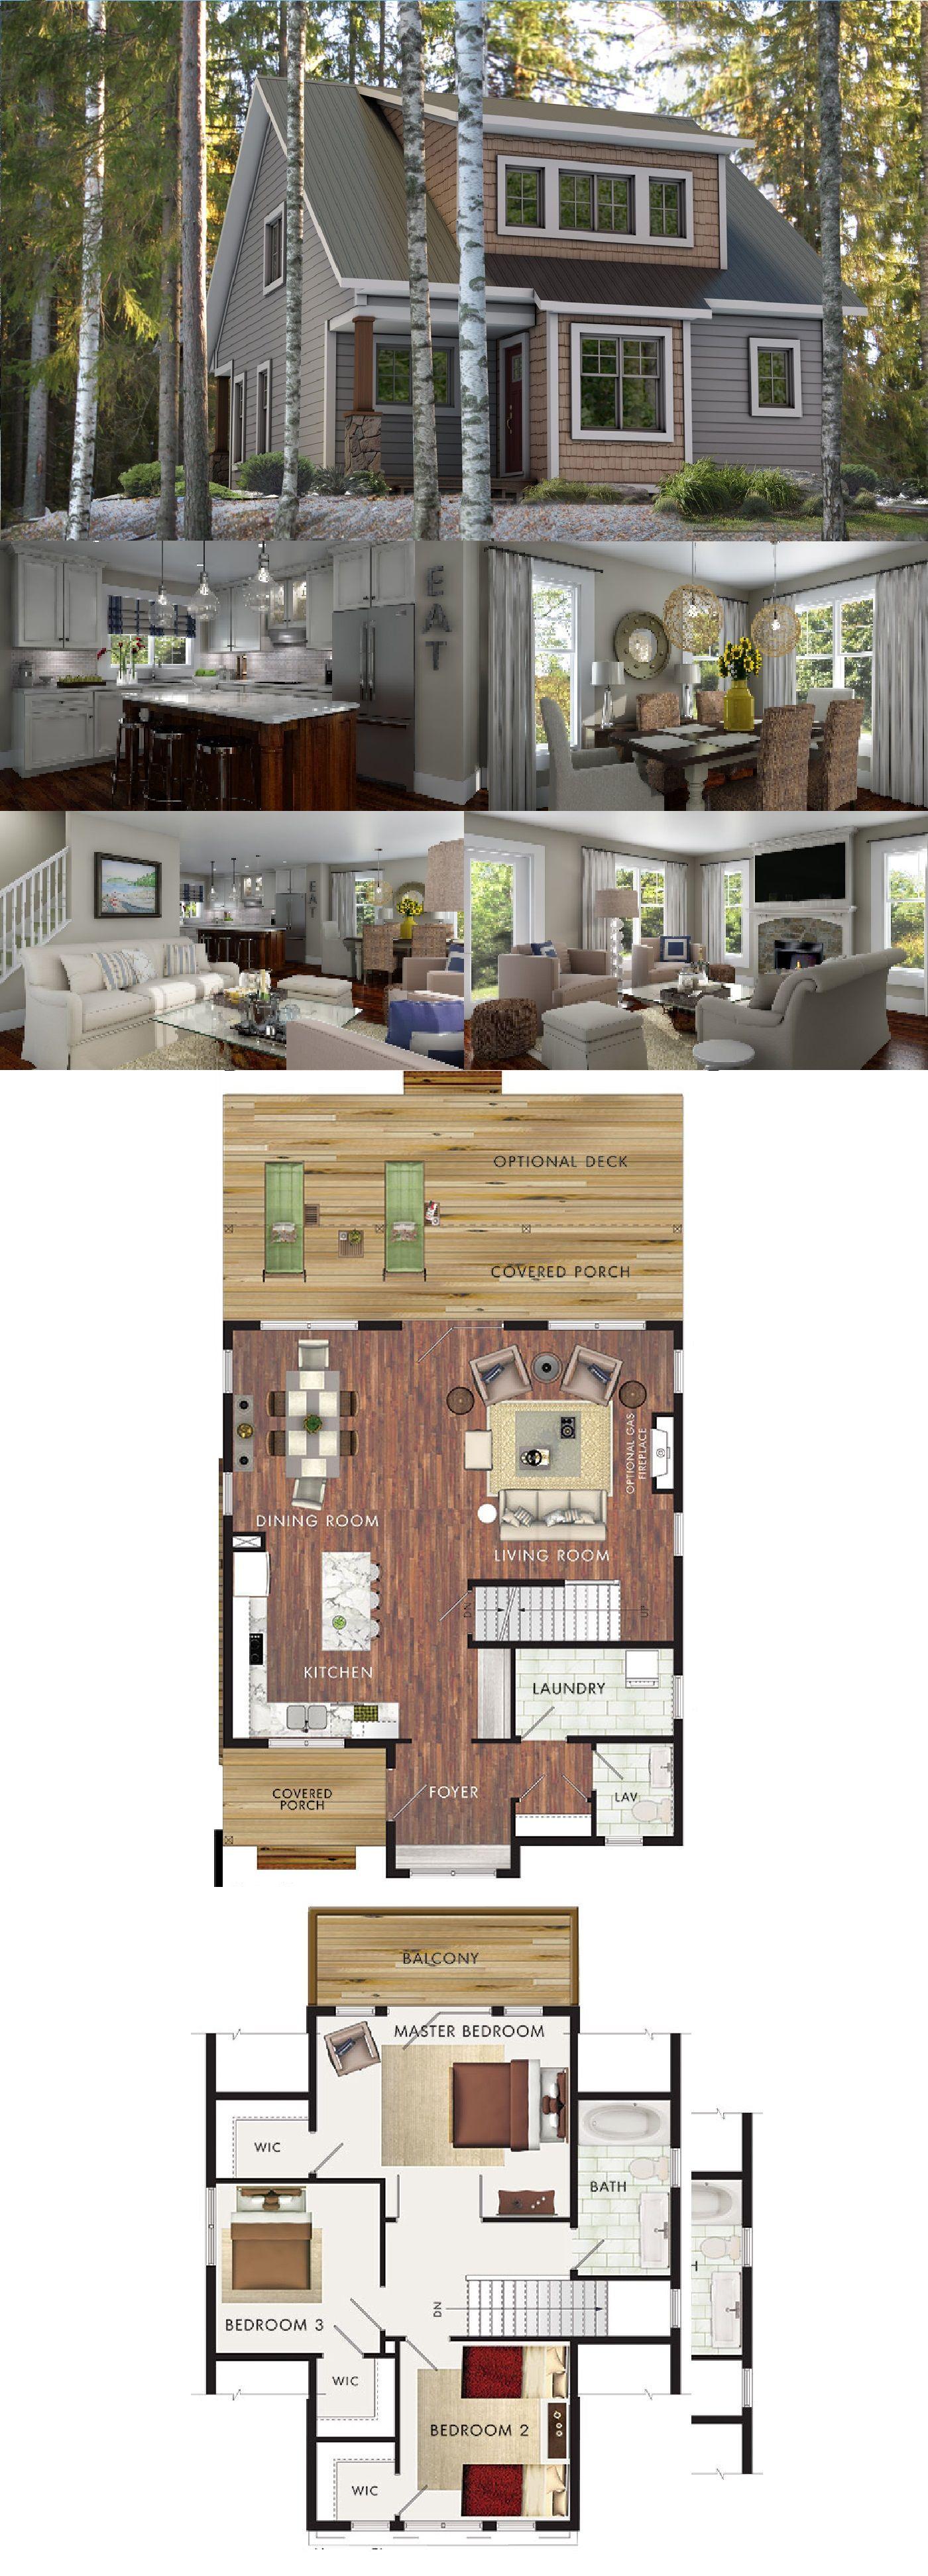 beaver homes u0026 cottages tidewater 998 sq ft house plans